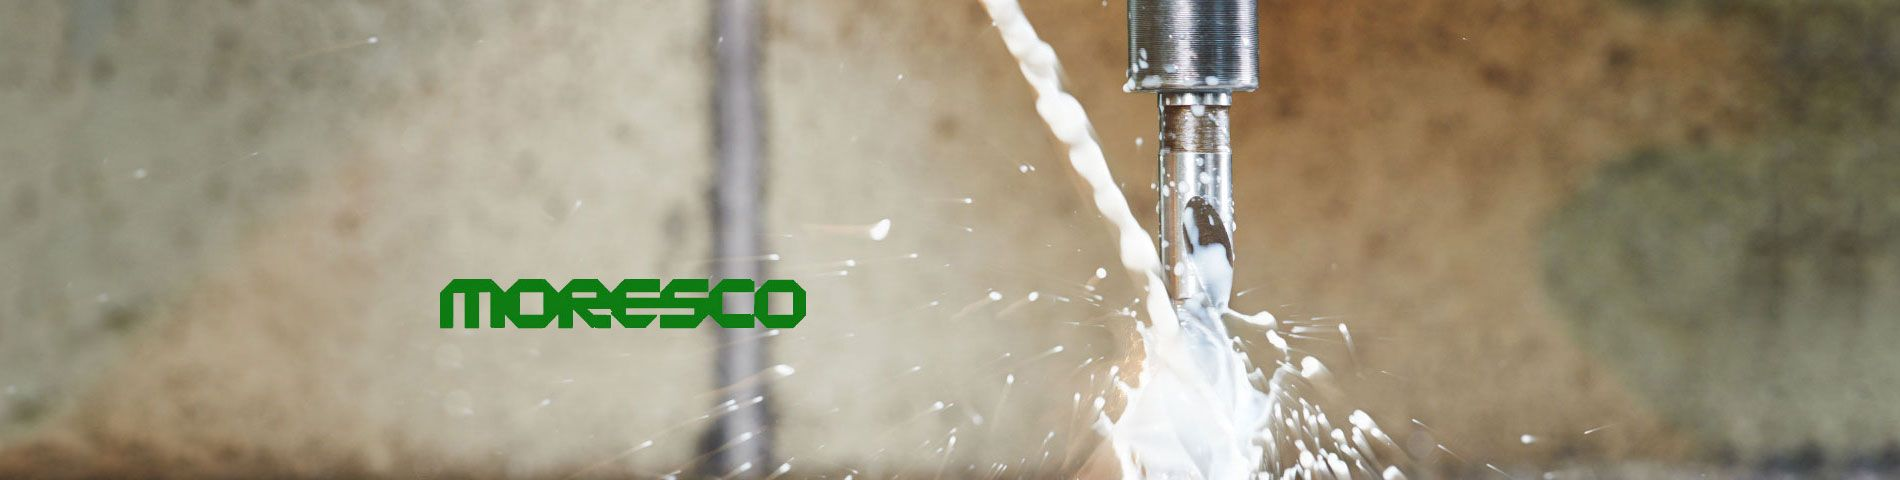 Lubrication needs Moresco oil